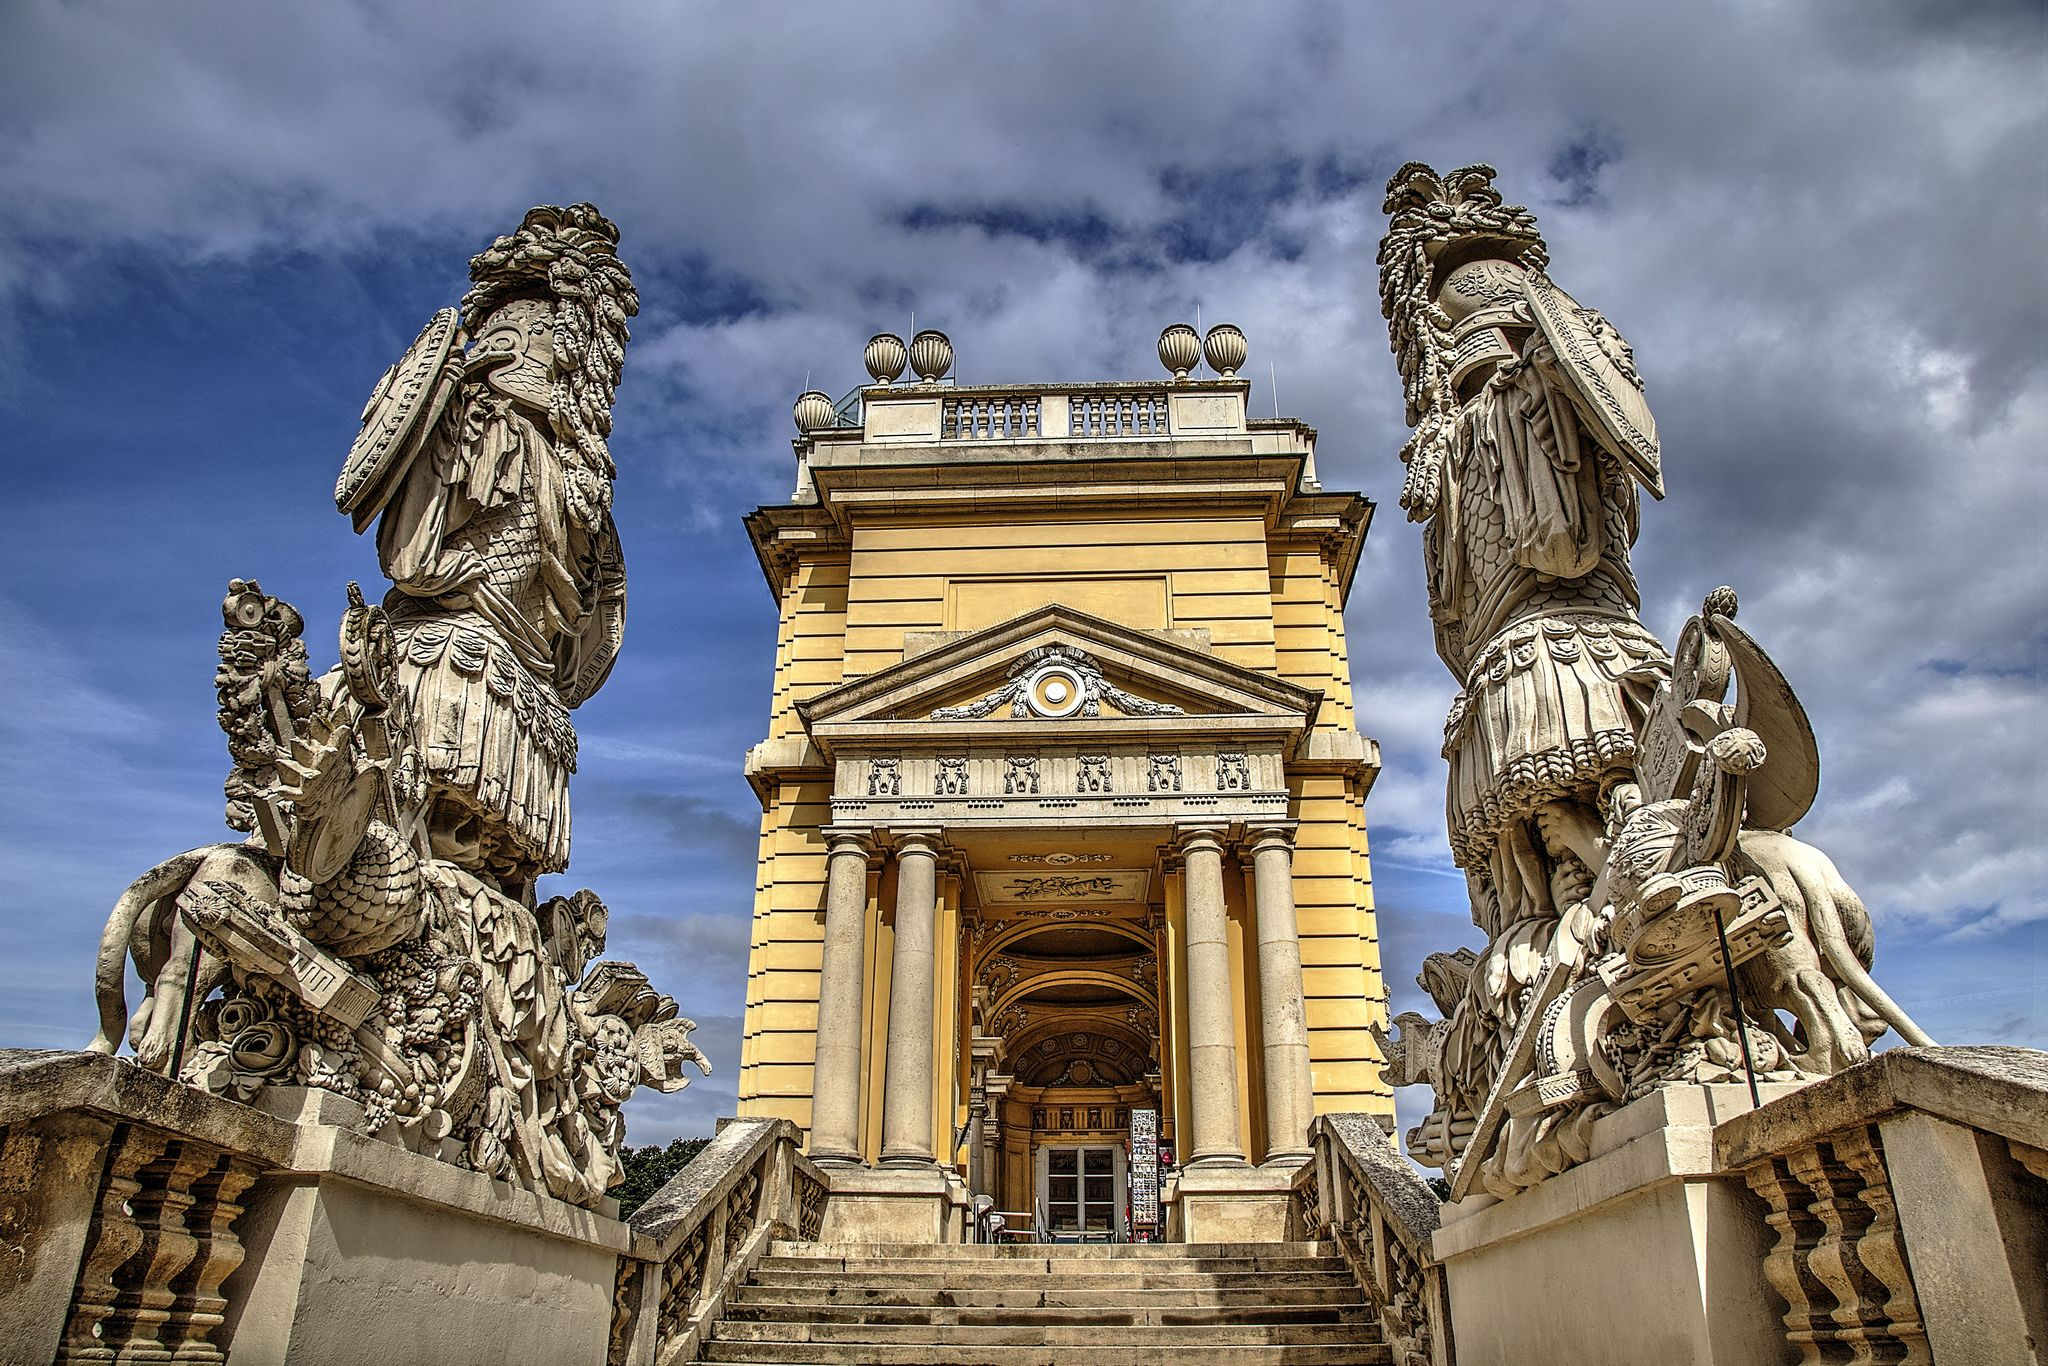 https://flic.kr/p/J2Xw47 | Schönbrunn Palace